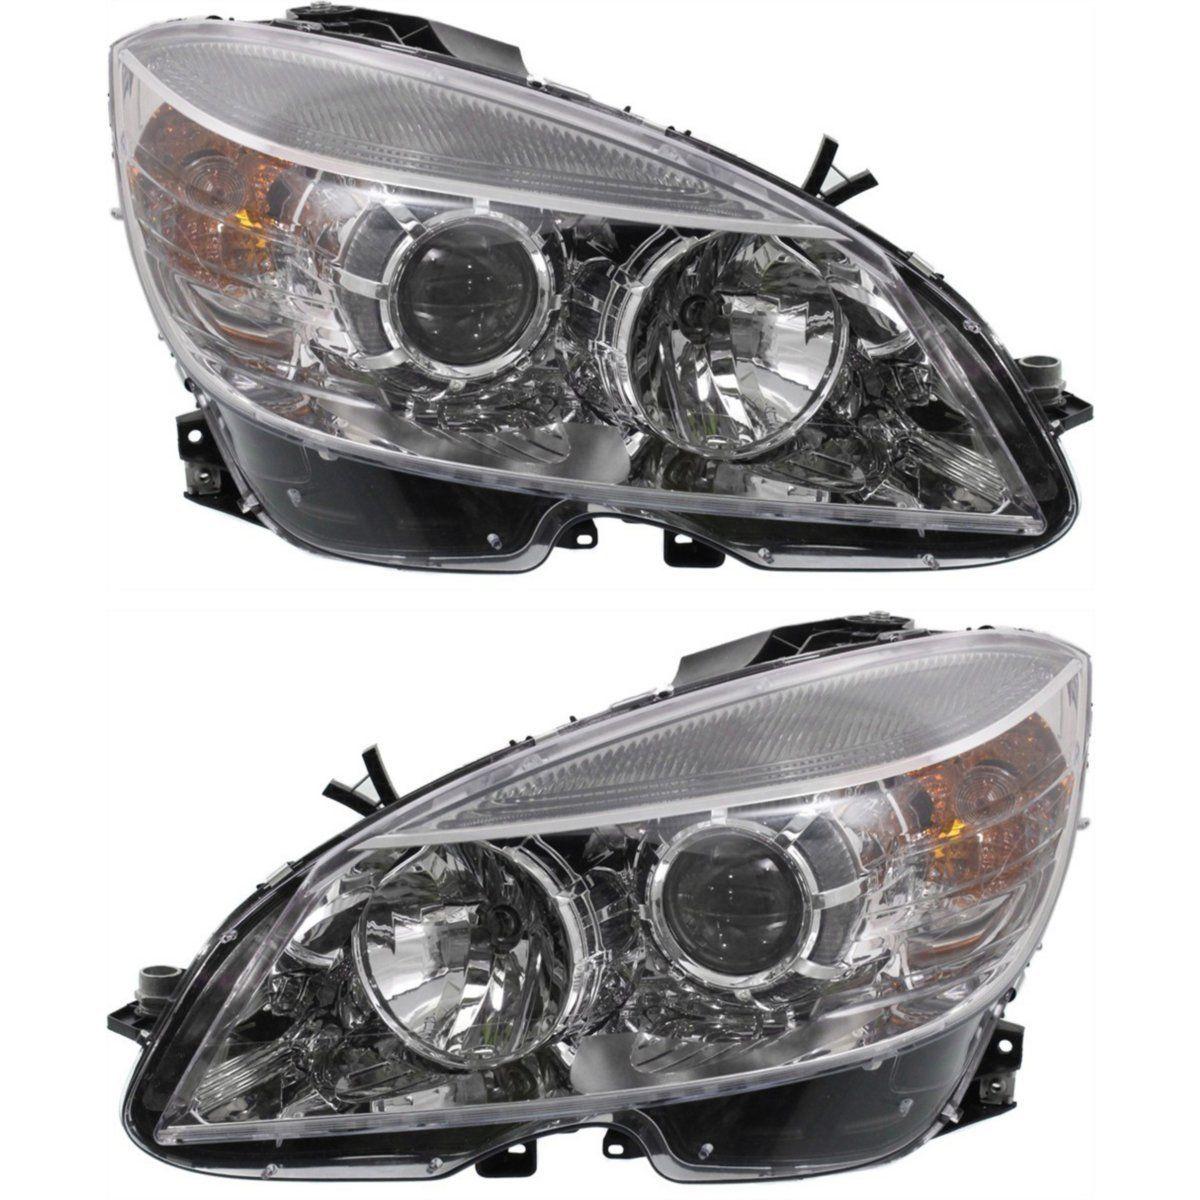 2008-2011 Mercedes Benz C300 C350 C63 Amg Headlight Assembly